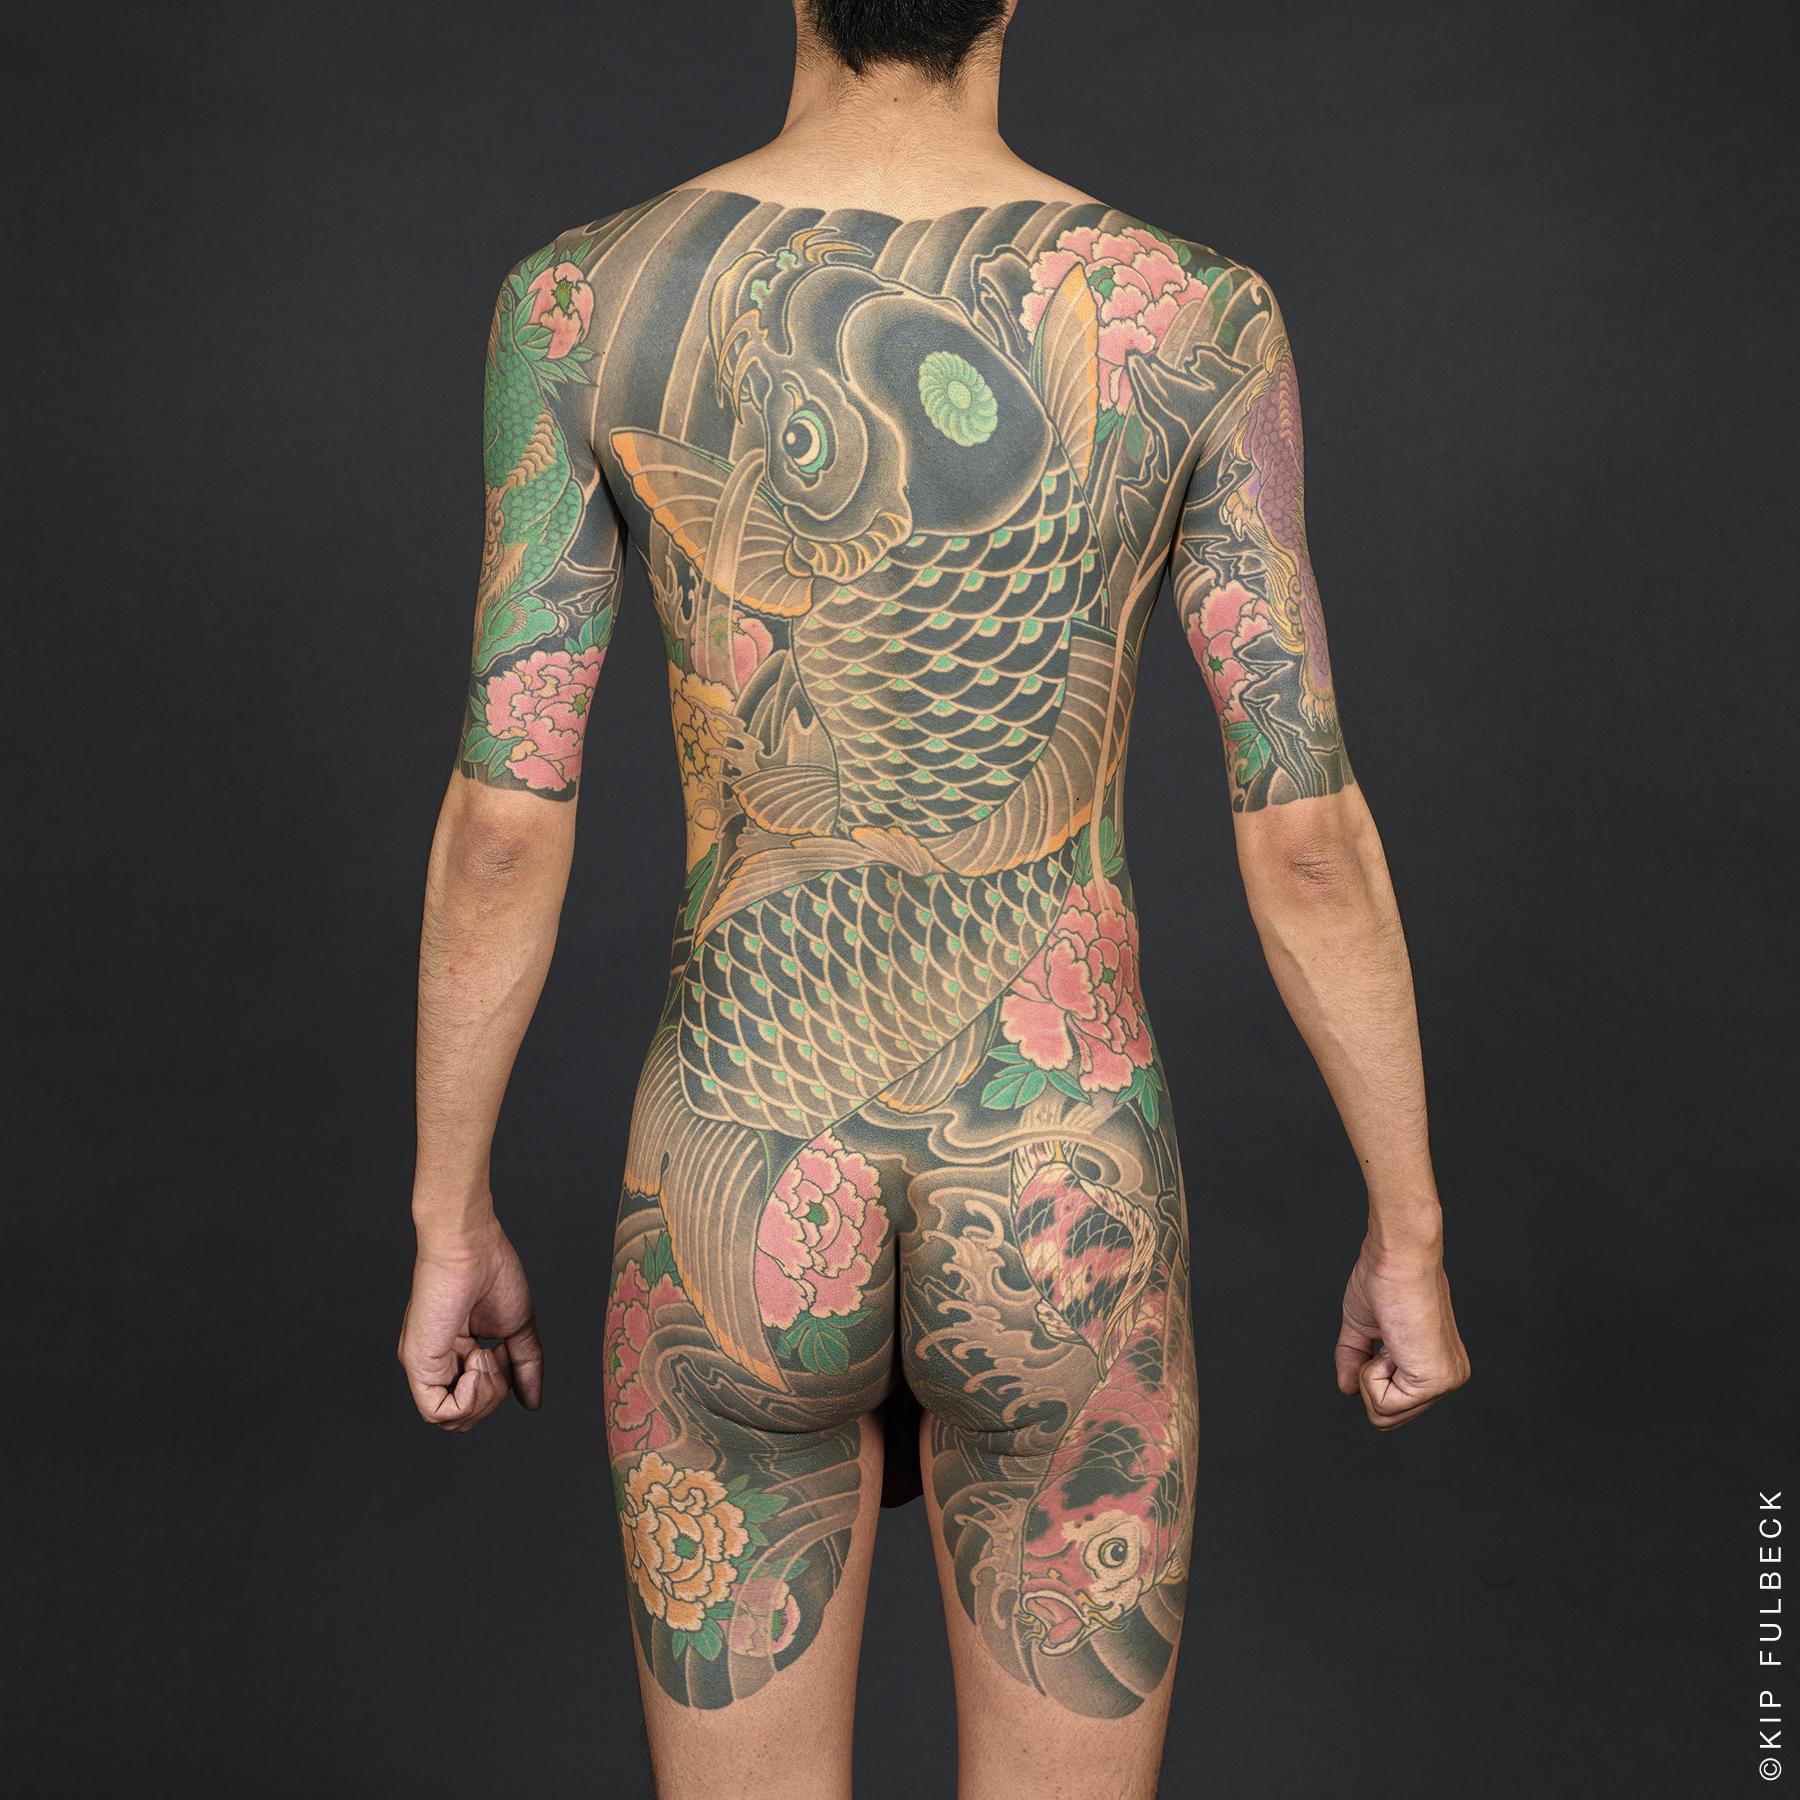 Tattoo by Miyazo. Photo by Kip Fulbeck